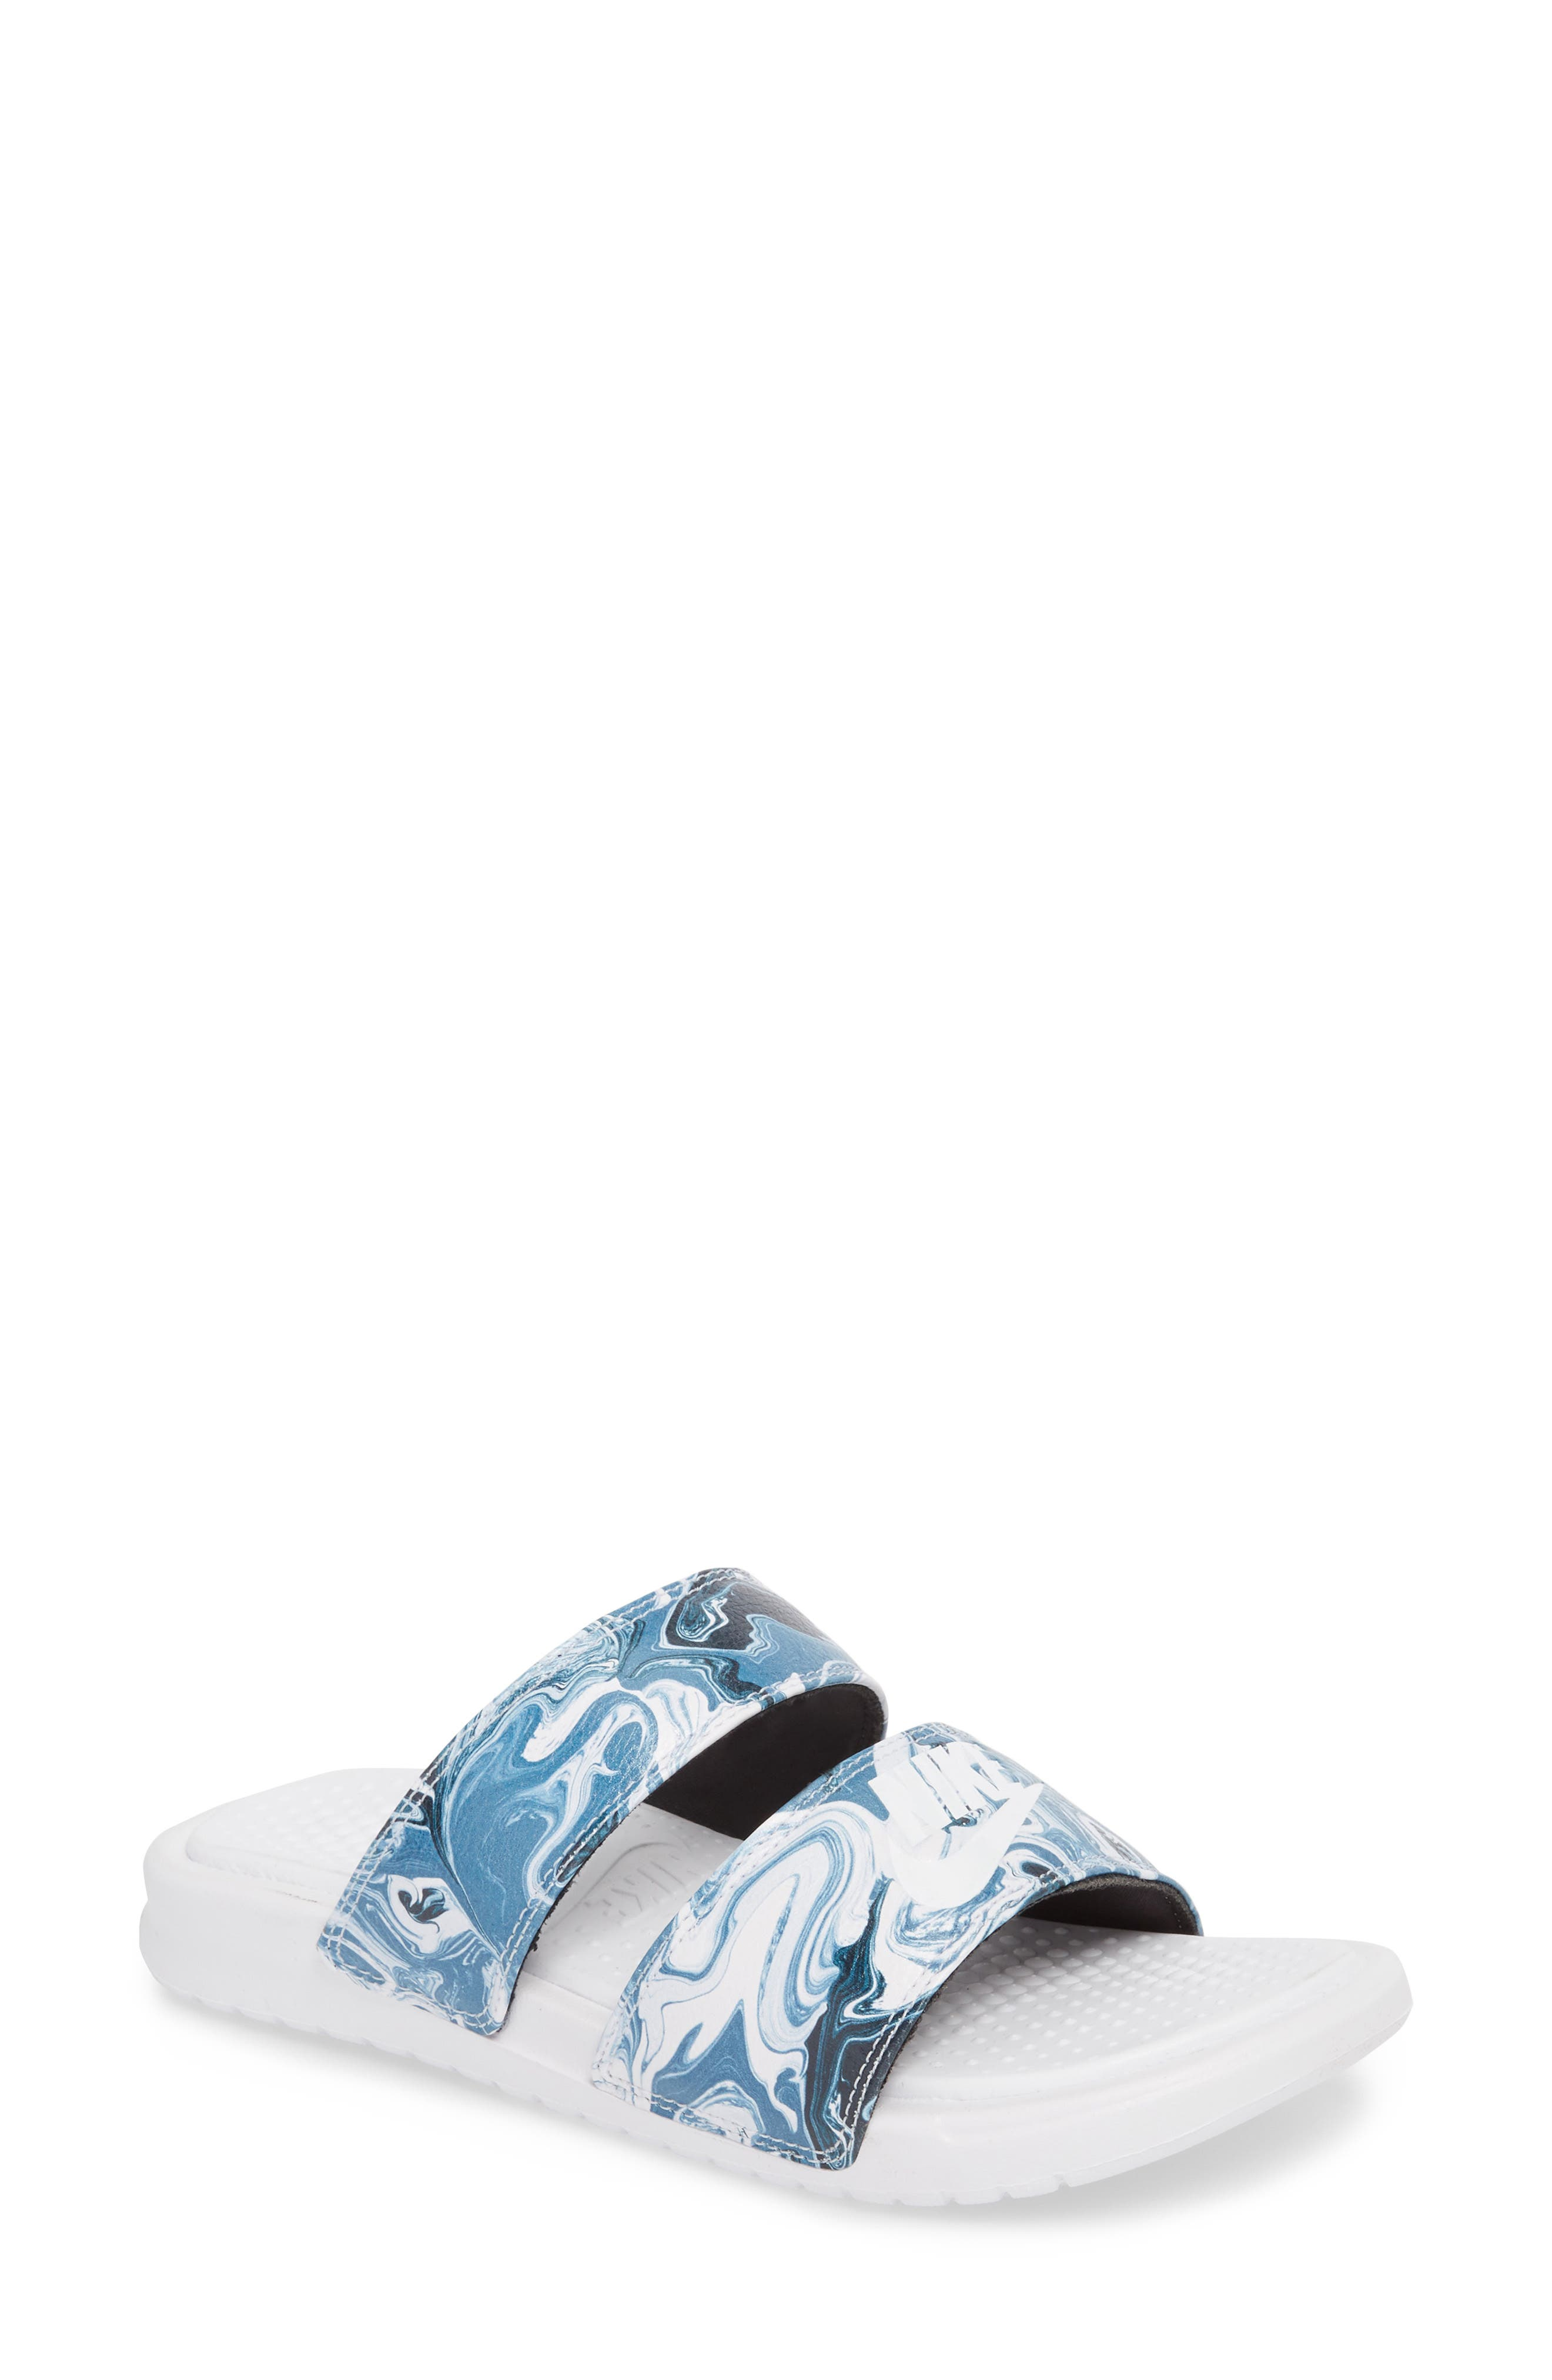 Benassi Duo Ultra Slide Sandal,                         Main,                         color, Black/ White